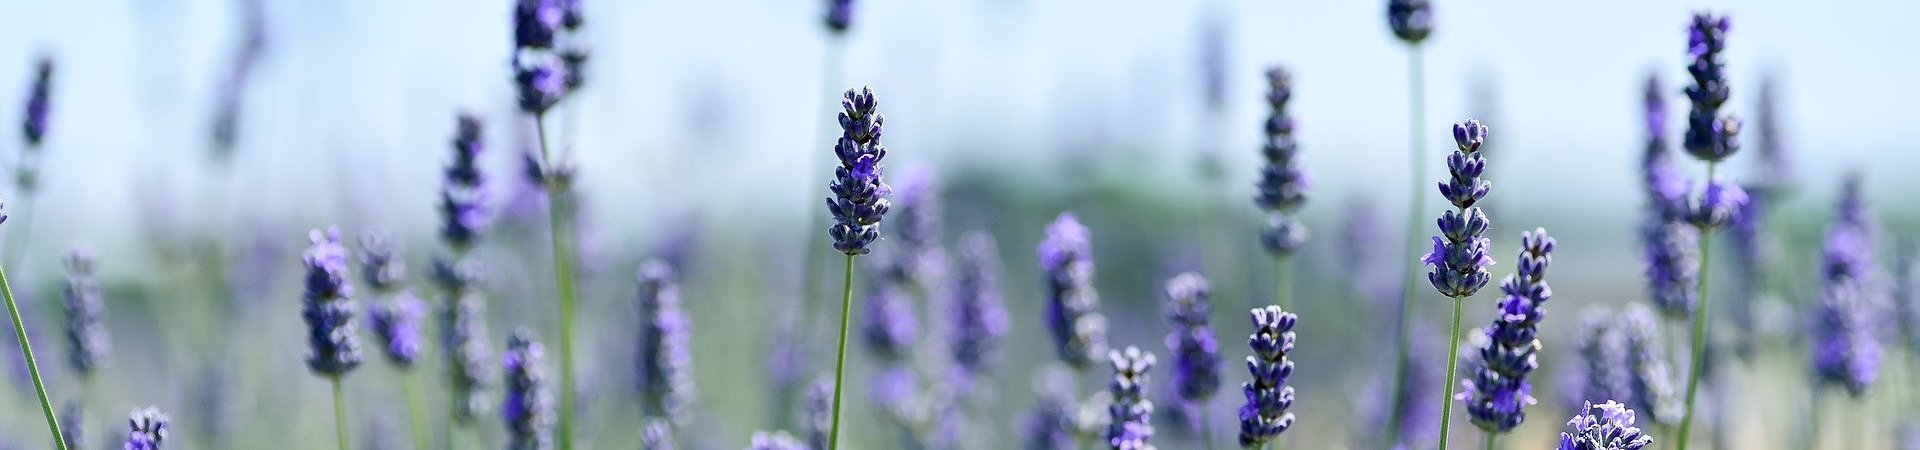 lavender-3490599_1920-aspect-ratio-x